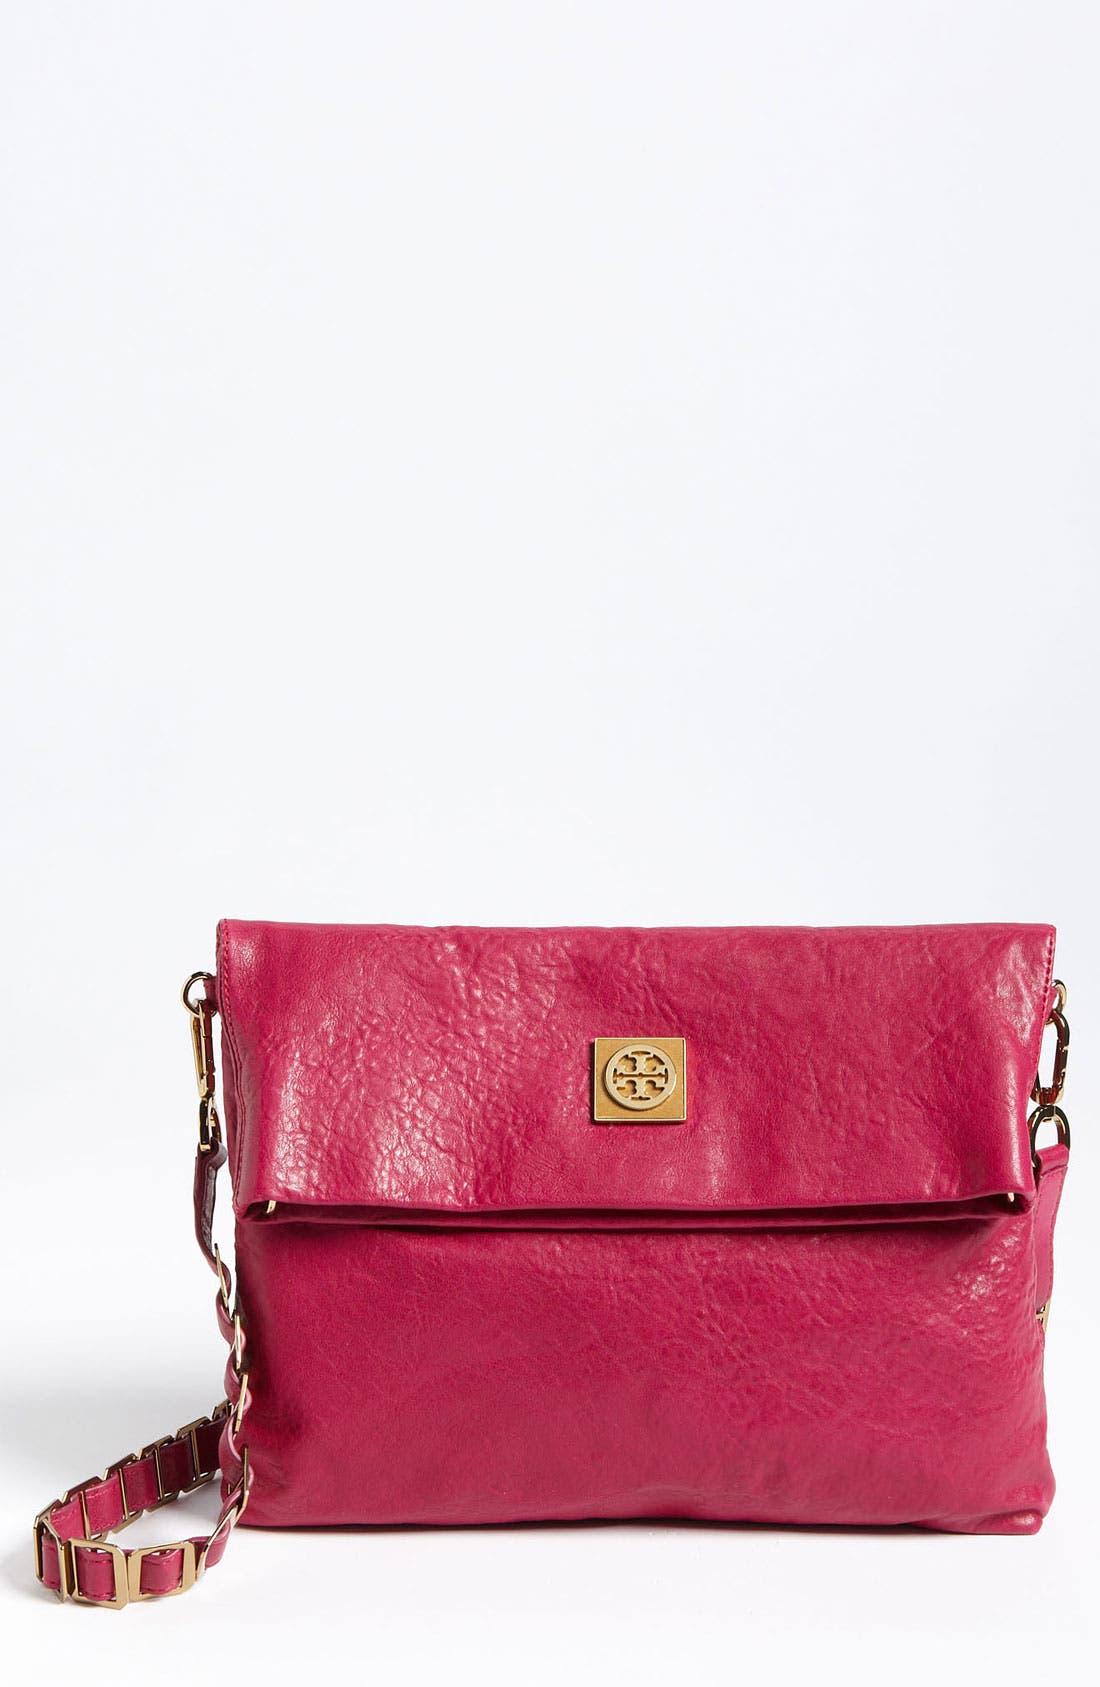 Main Image - Tory Burch 'Louiisa' Crossbody Bag